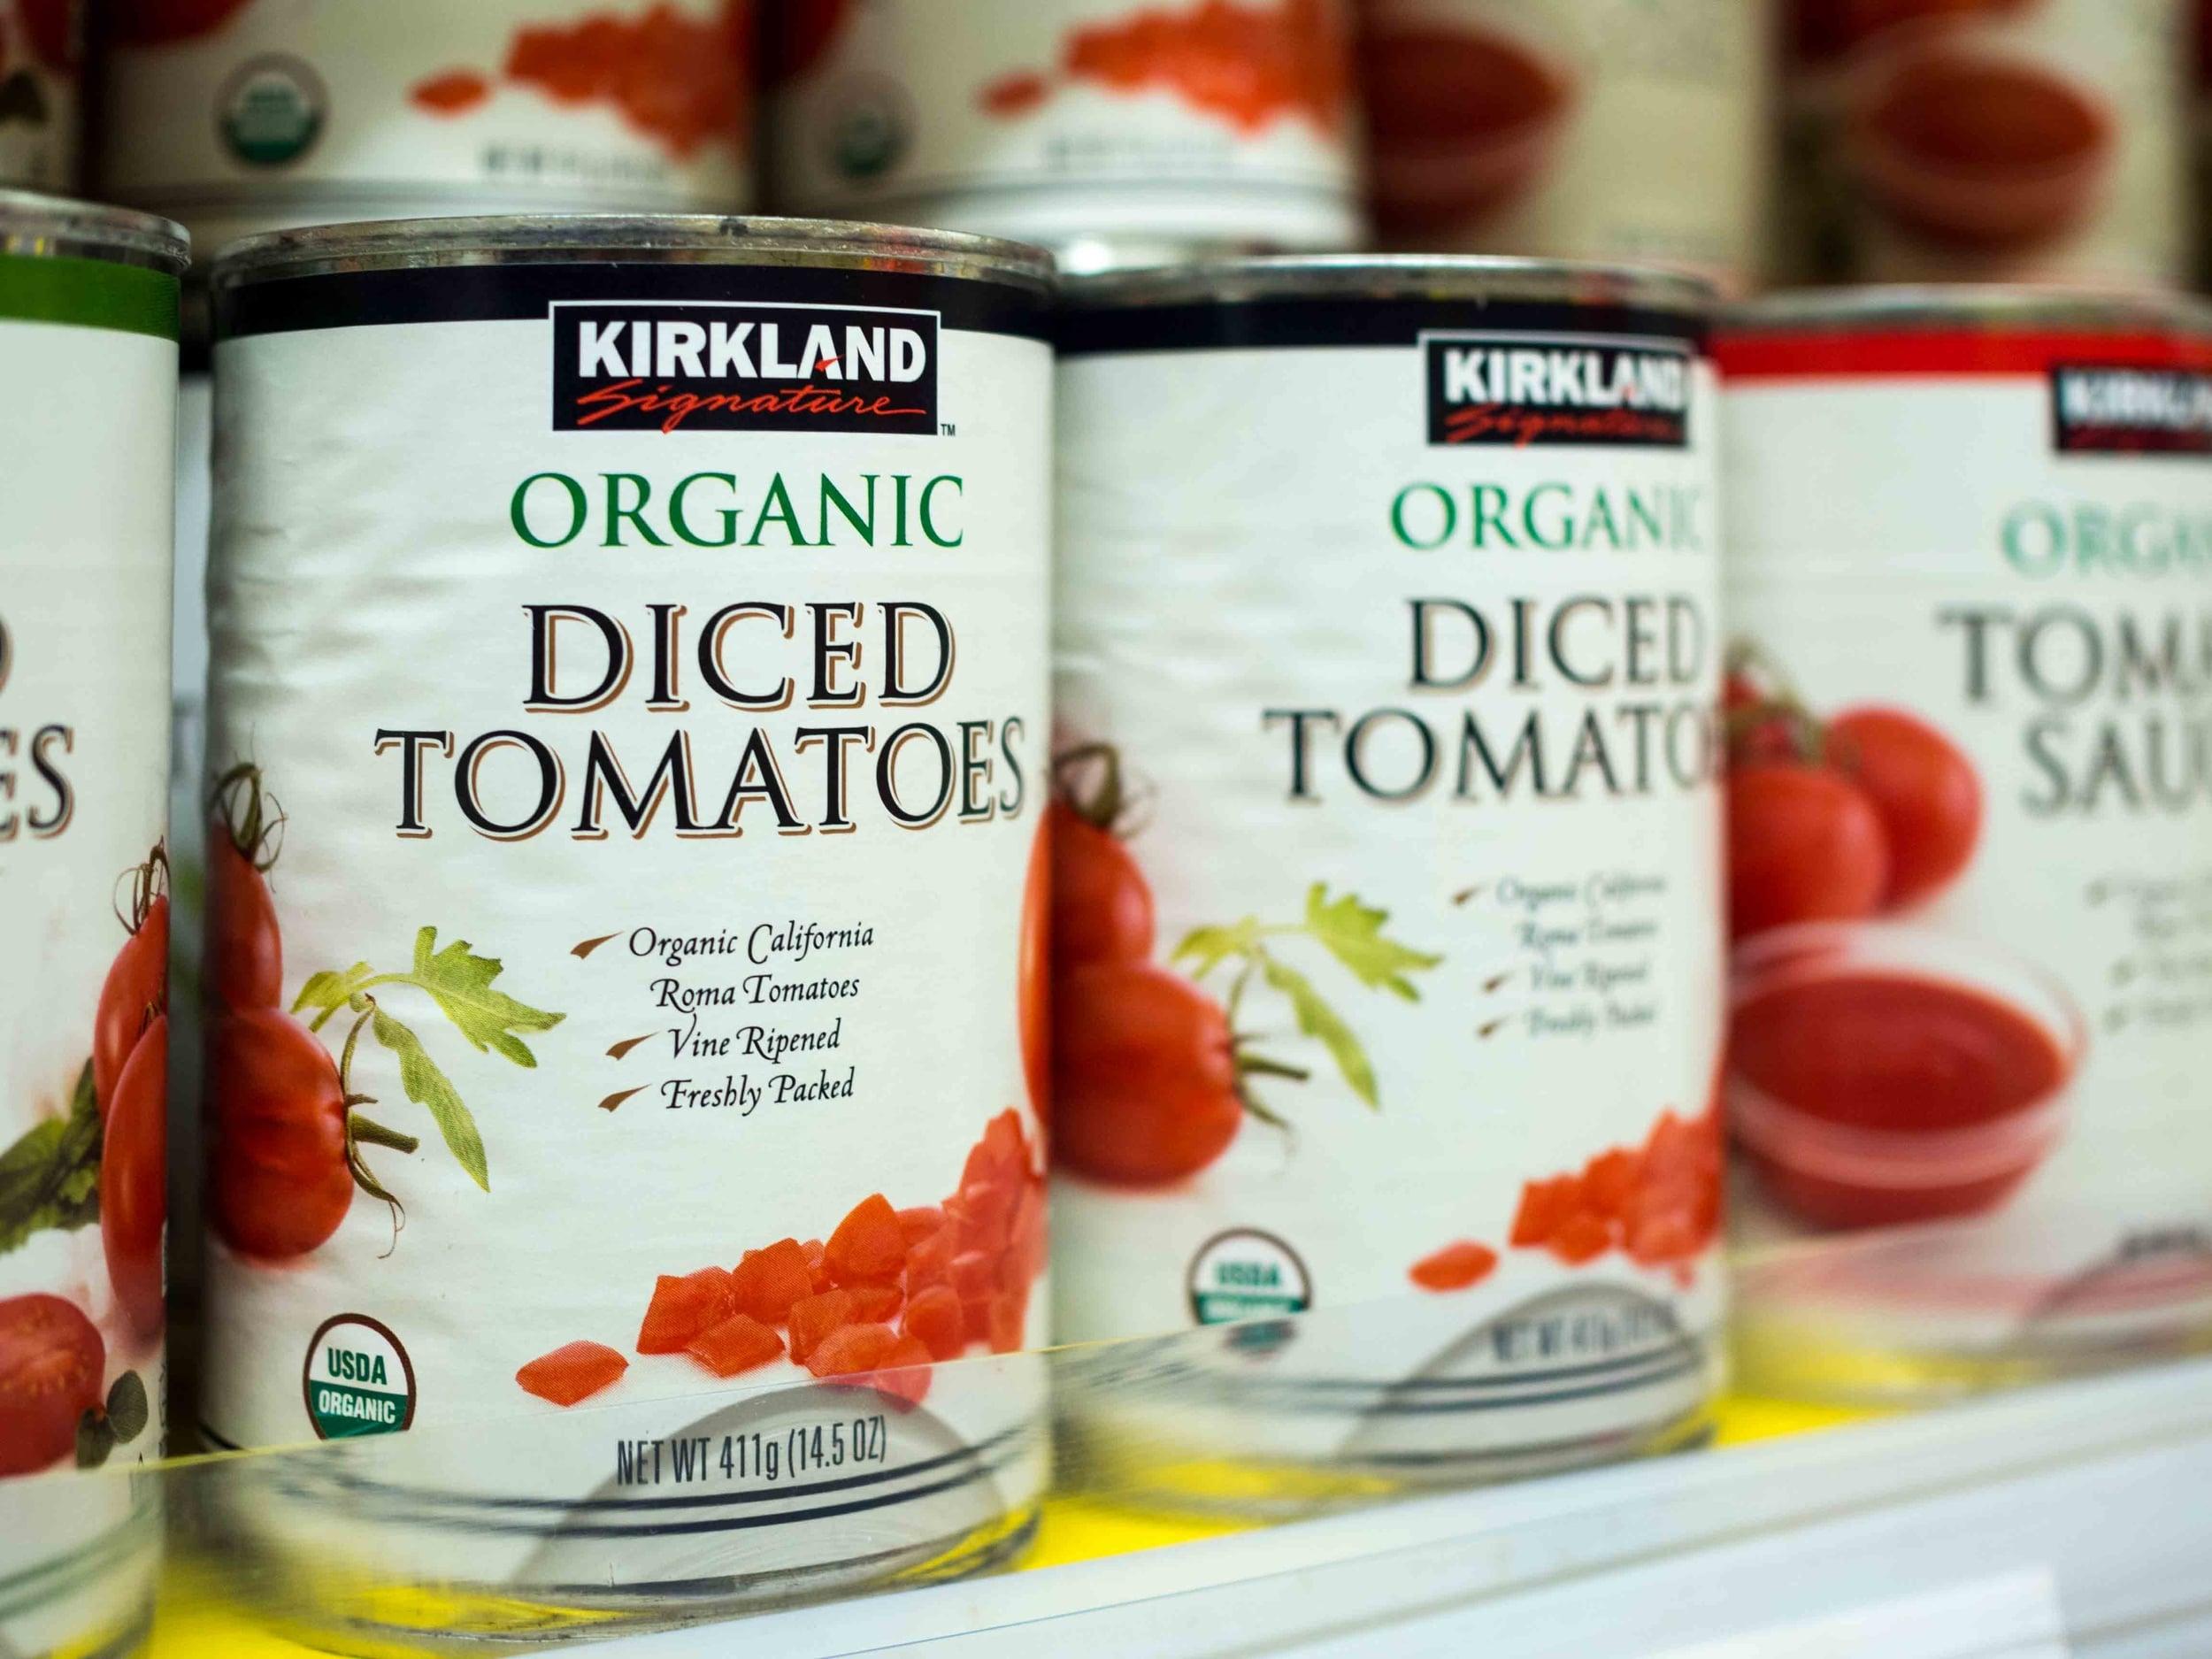 Organic California Diced Tomatoes